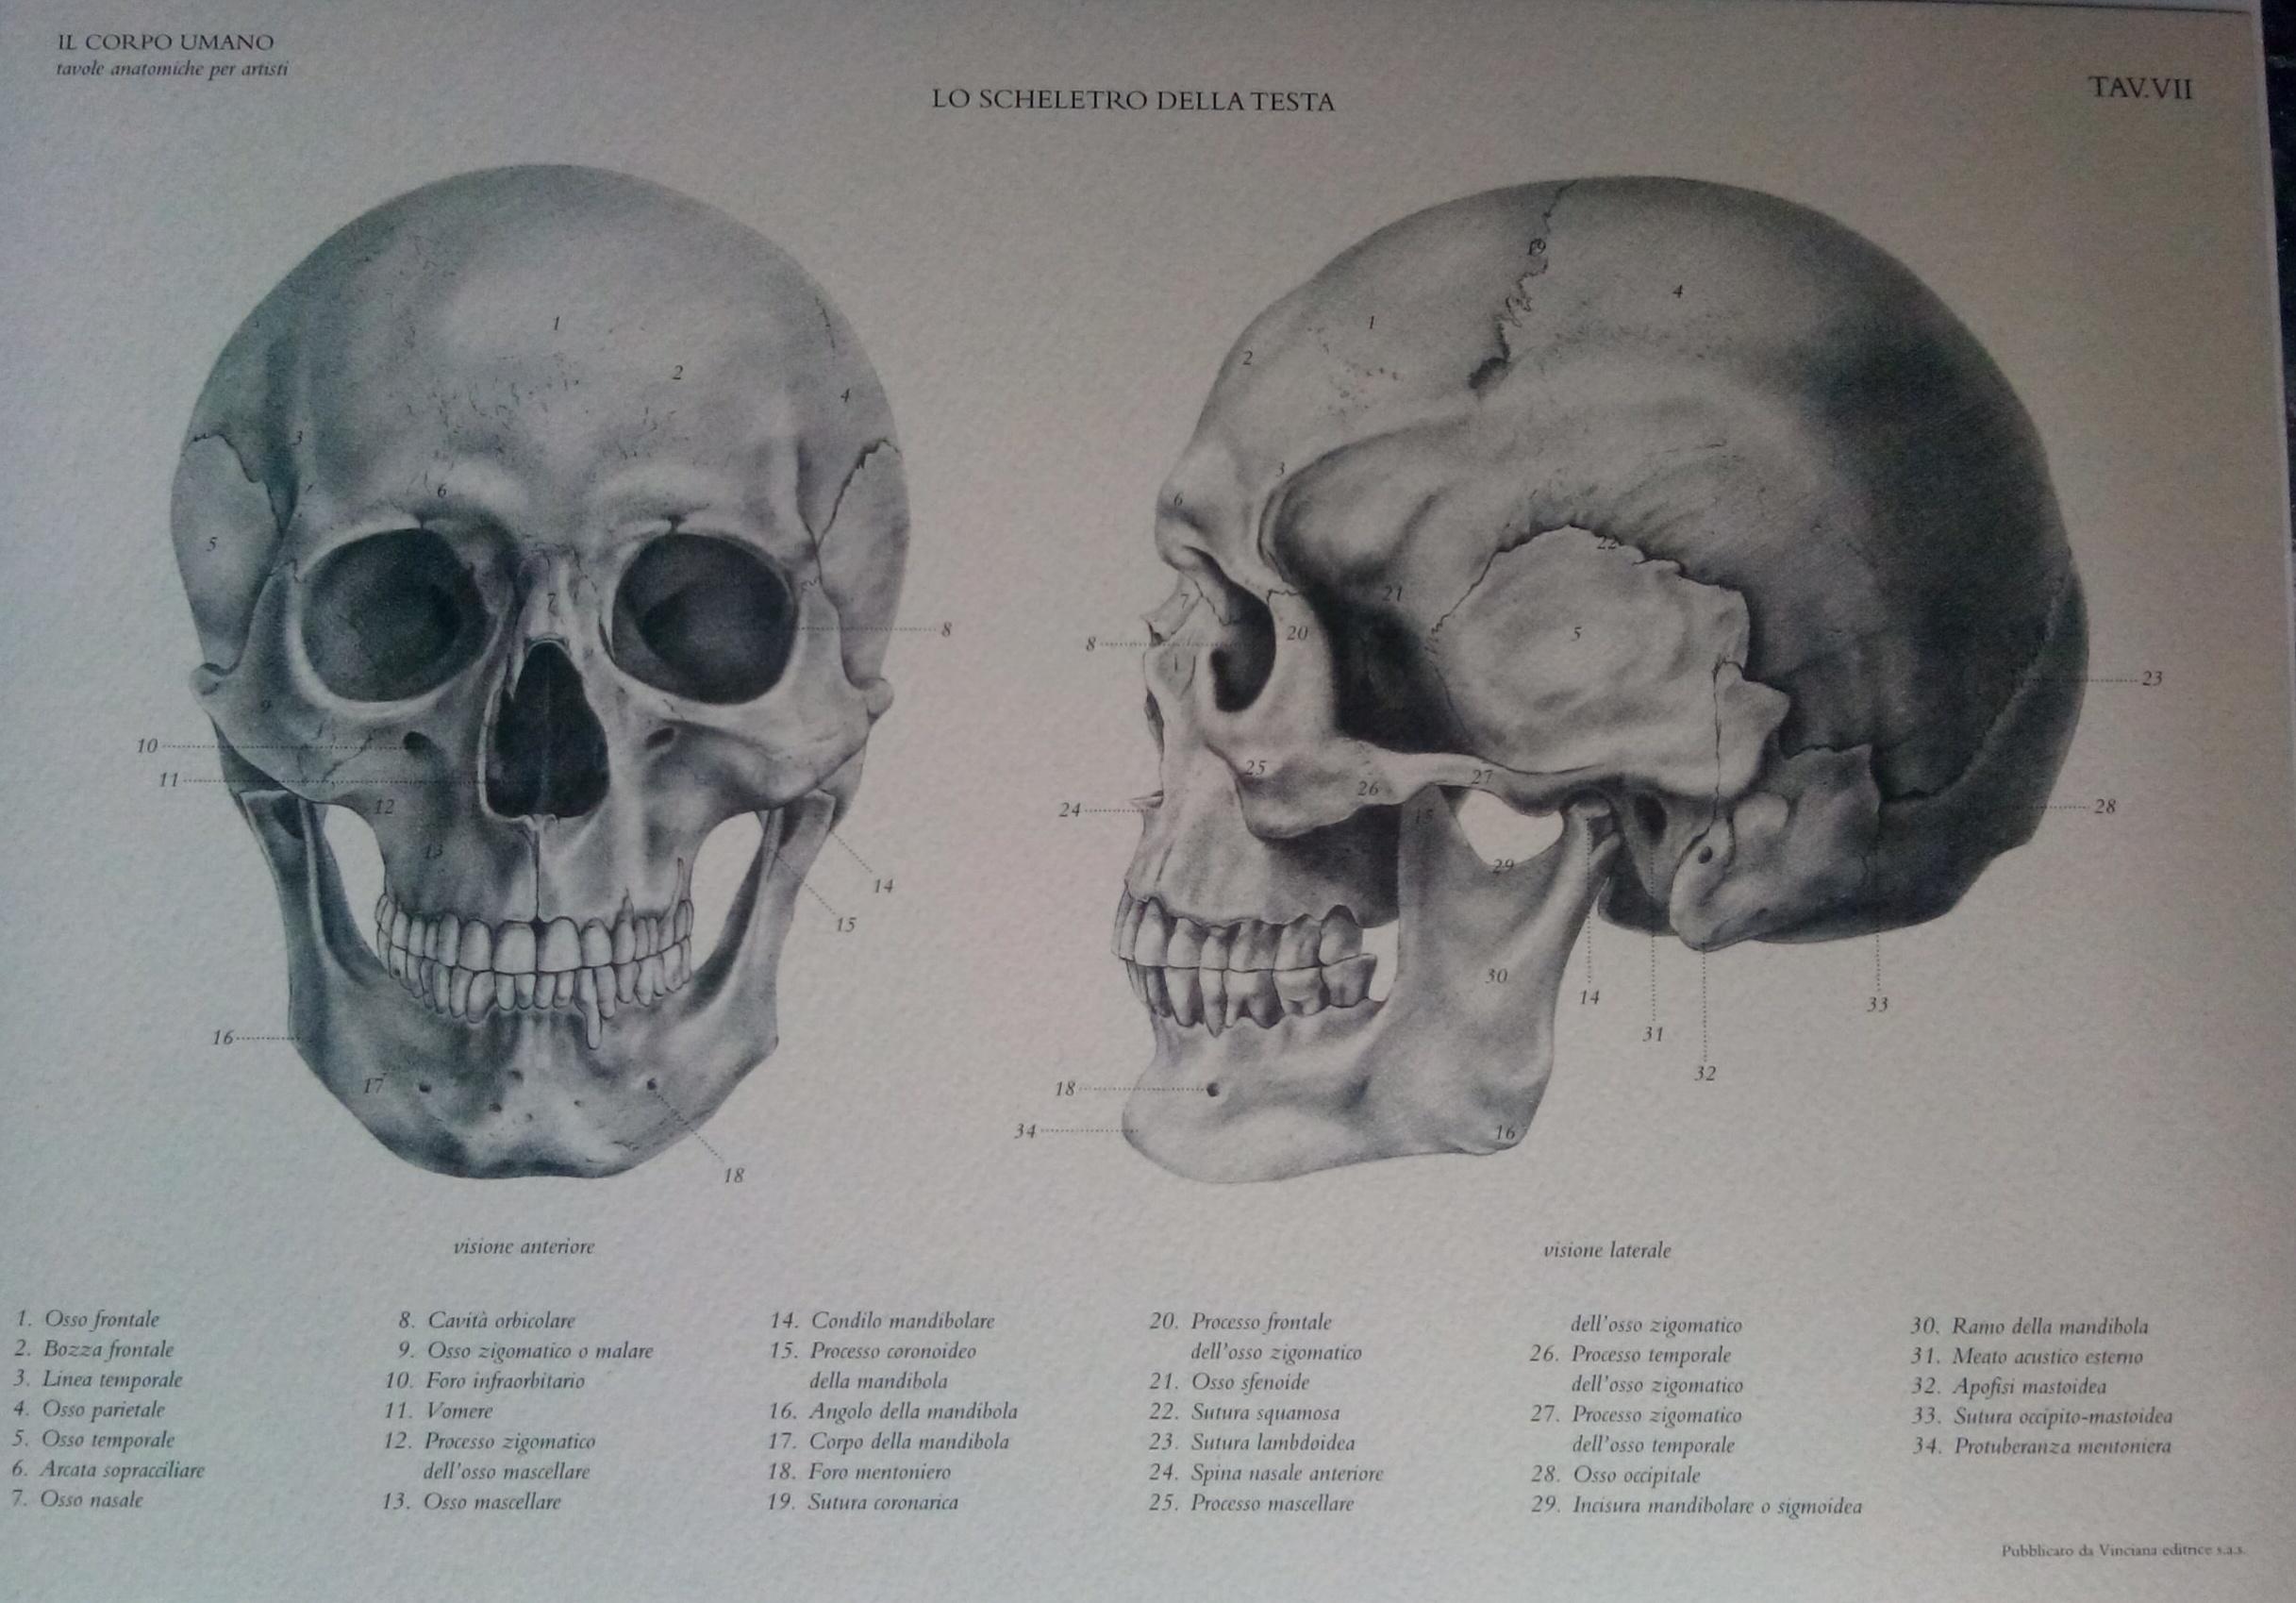 Skull anatomy drawing